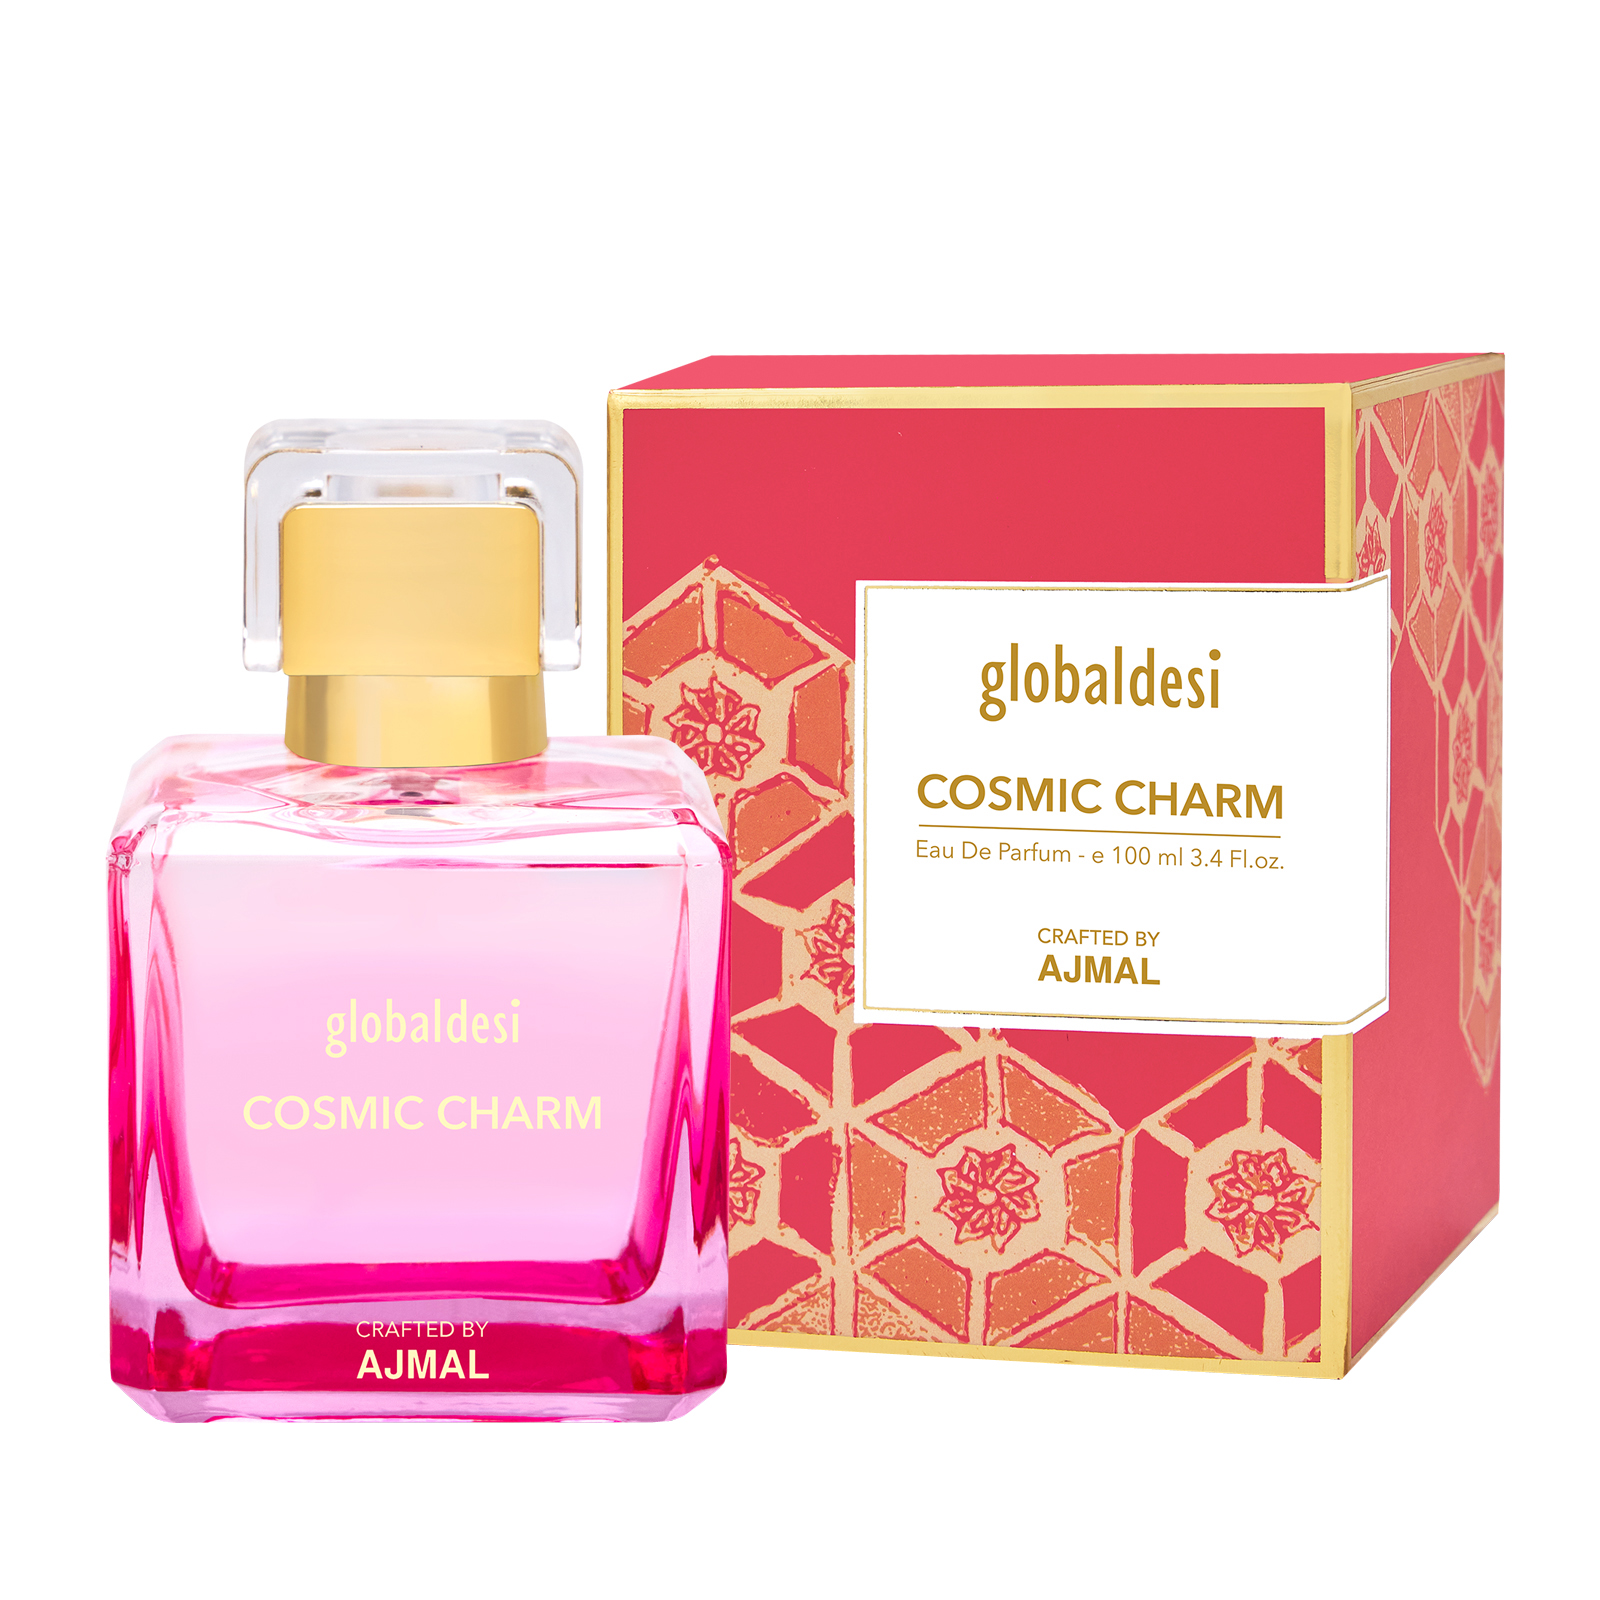 Global Desi Crafted By Ajmal | Global Desi Cosmic Charm Eau De Parfum 100ML for Women Crafted by Ajmal